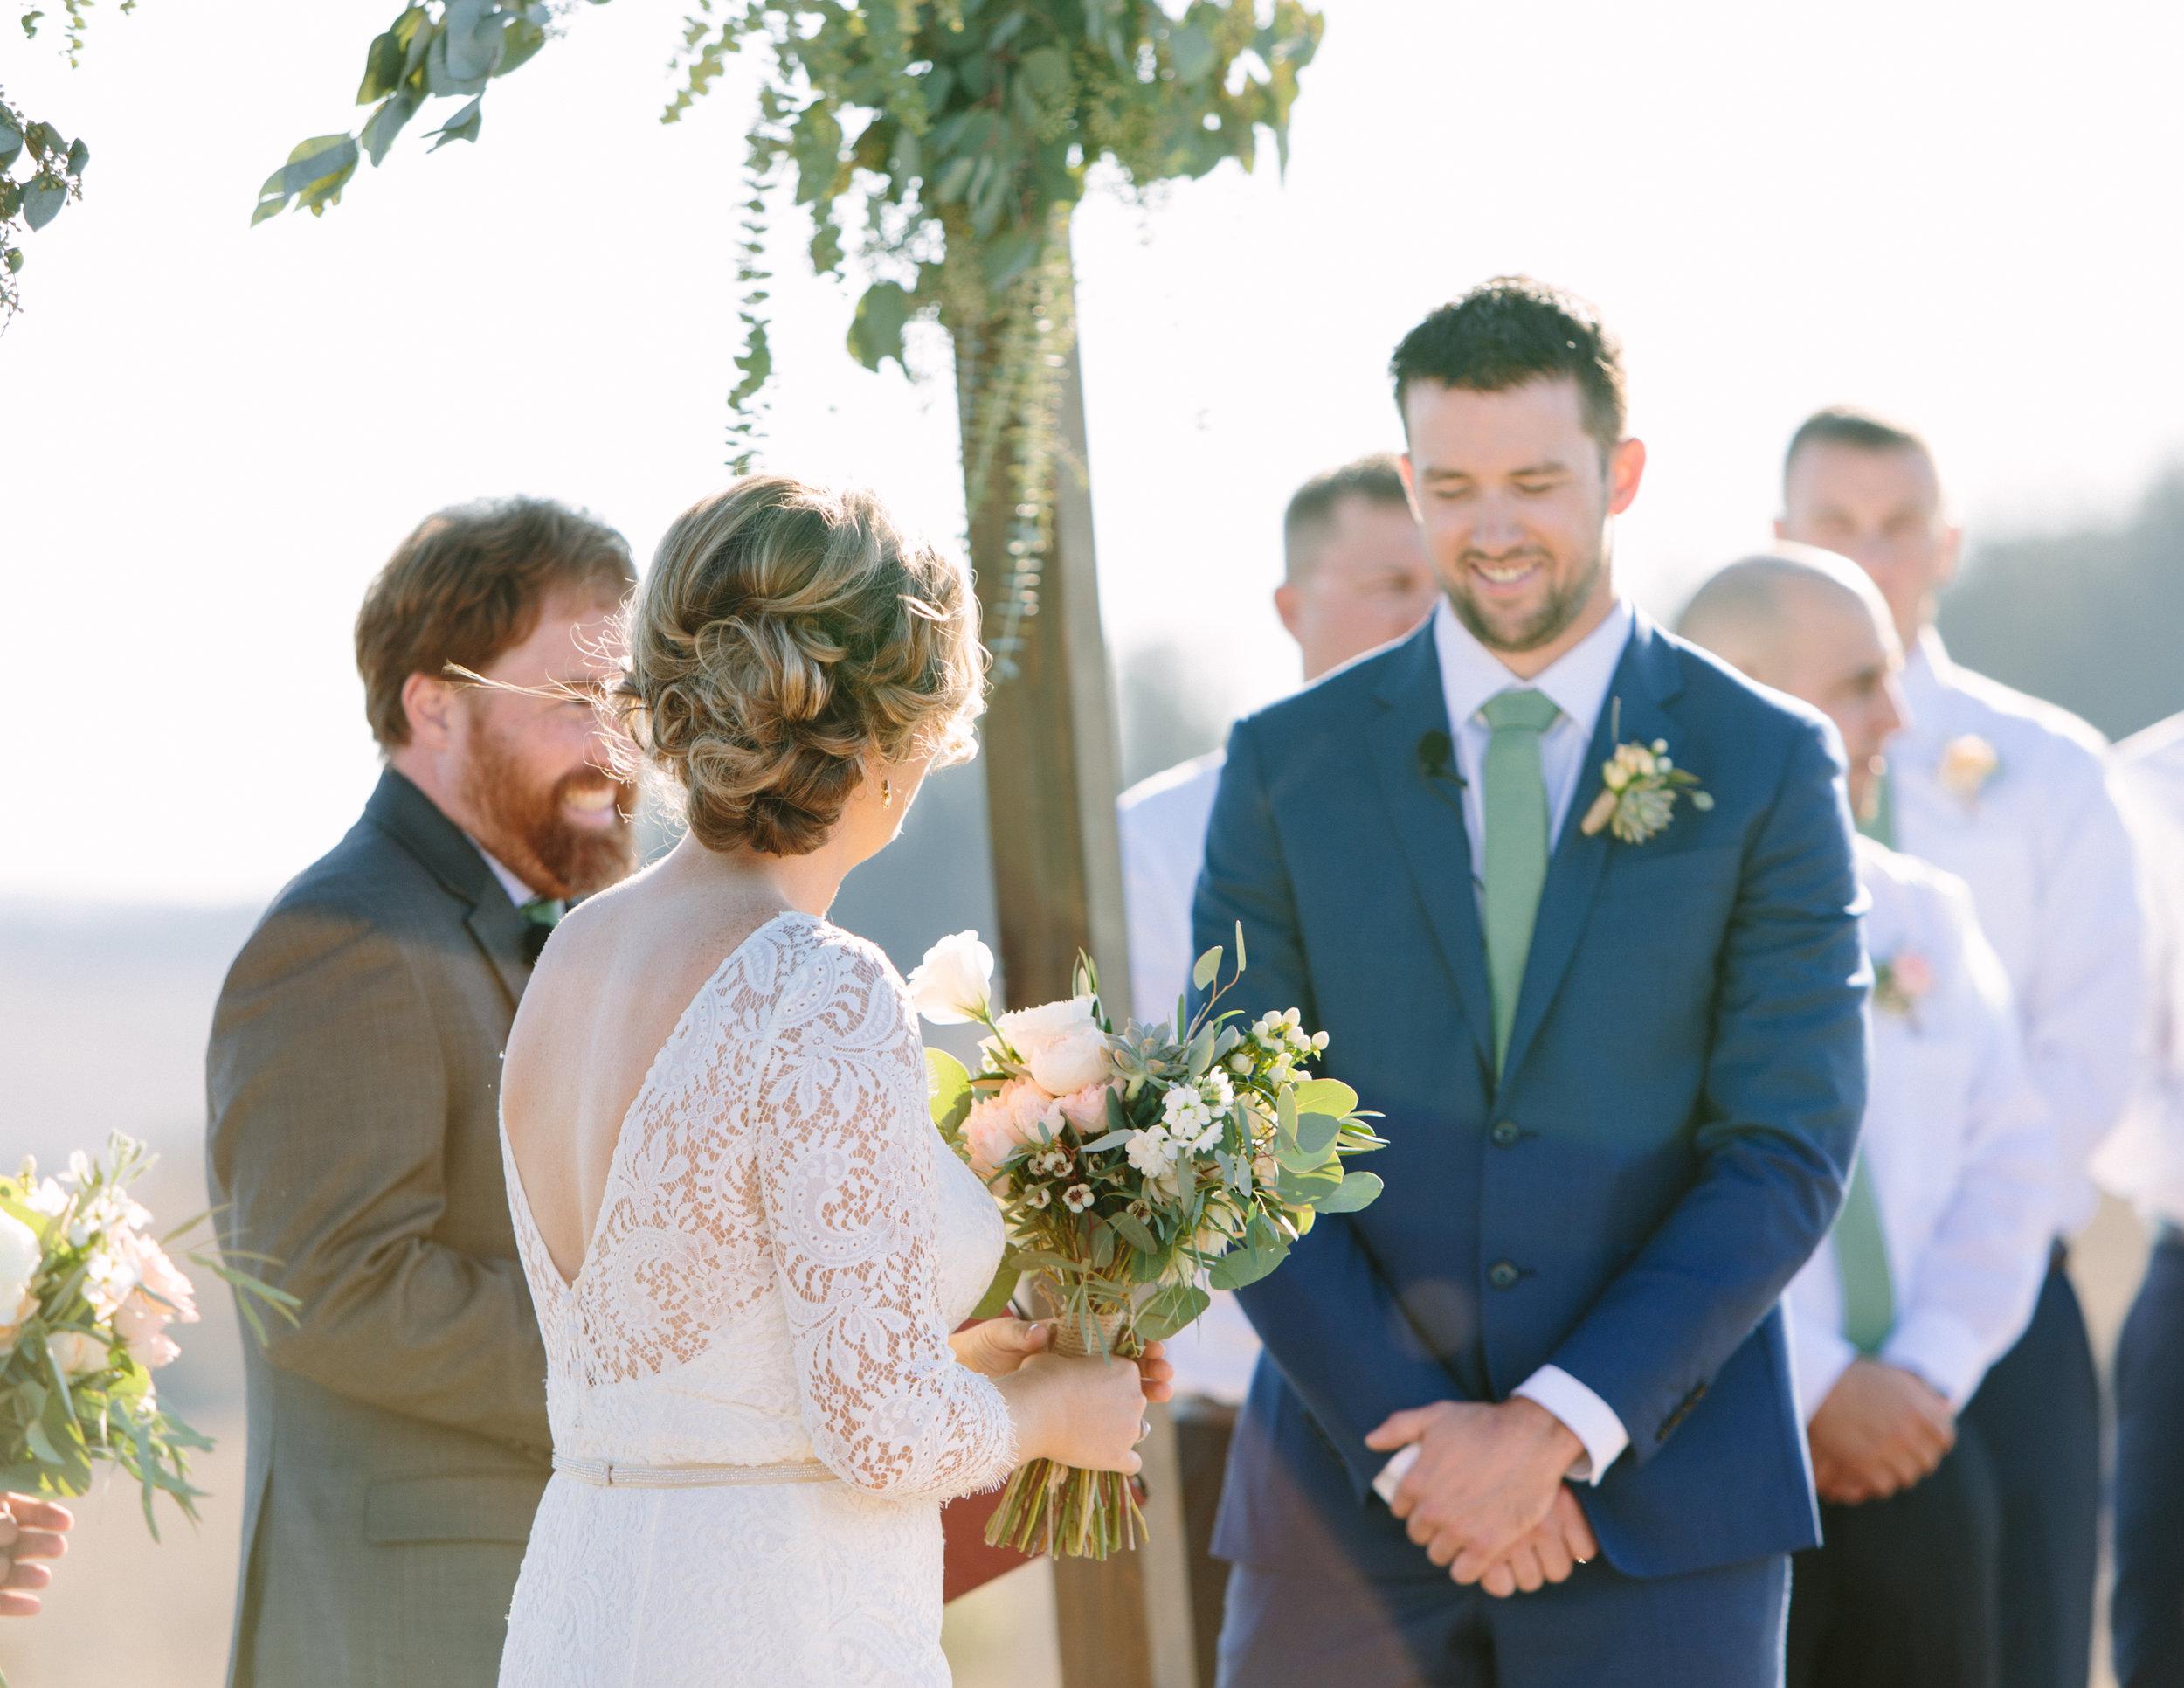 bloomfield farms wedding 4.jpg